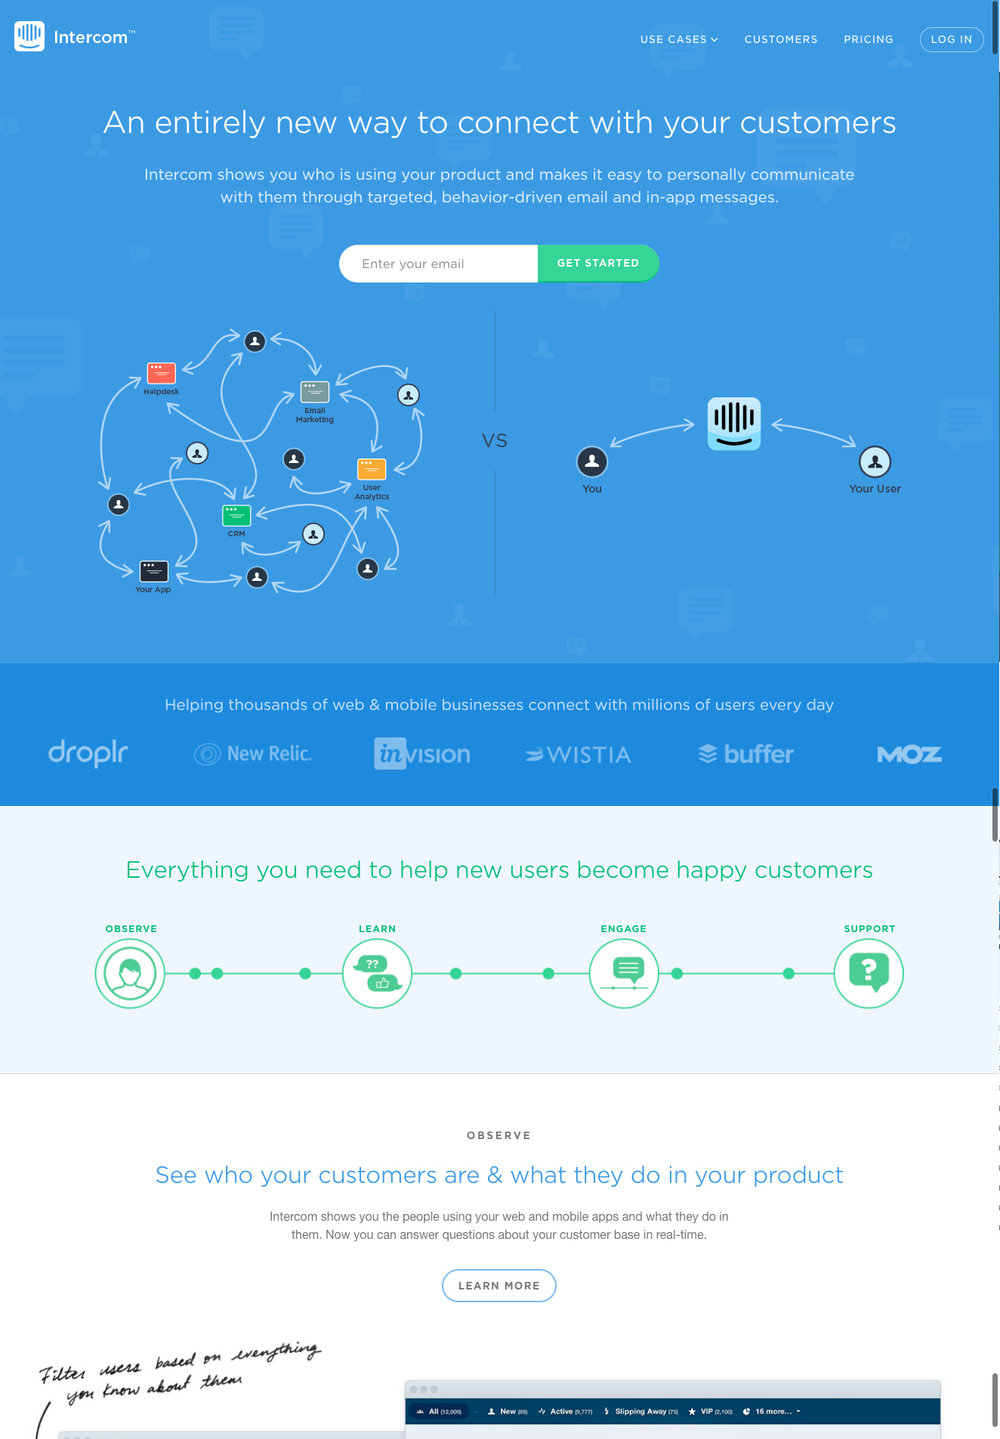 Intercom website, 2015